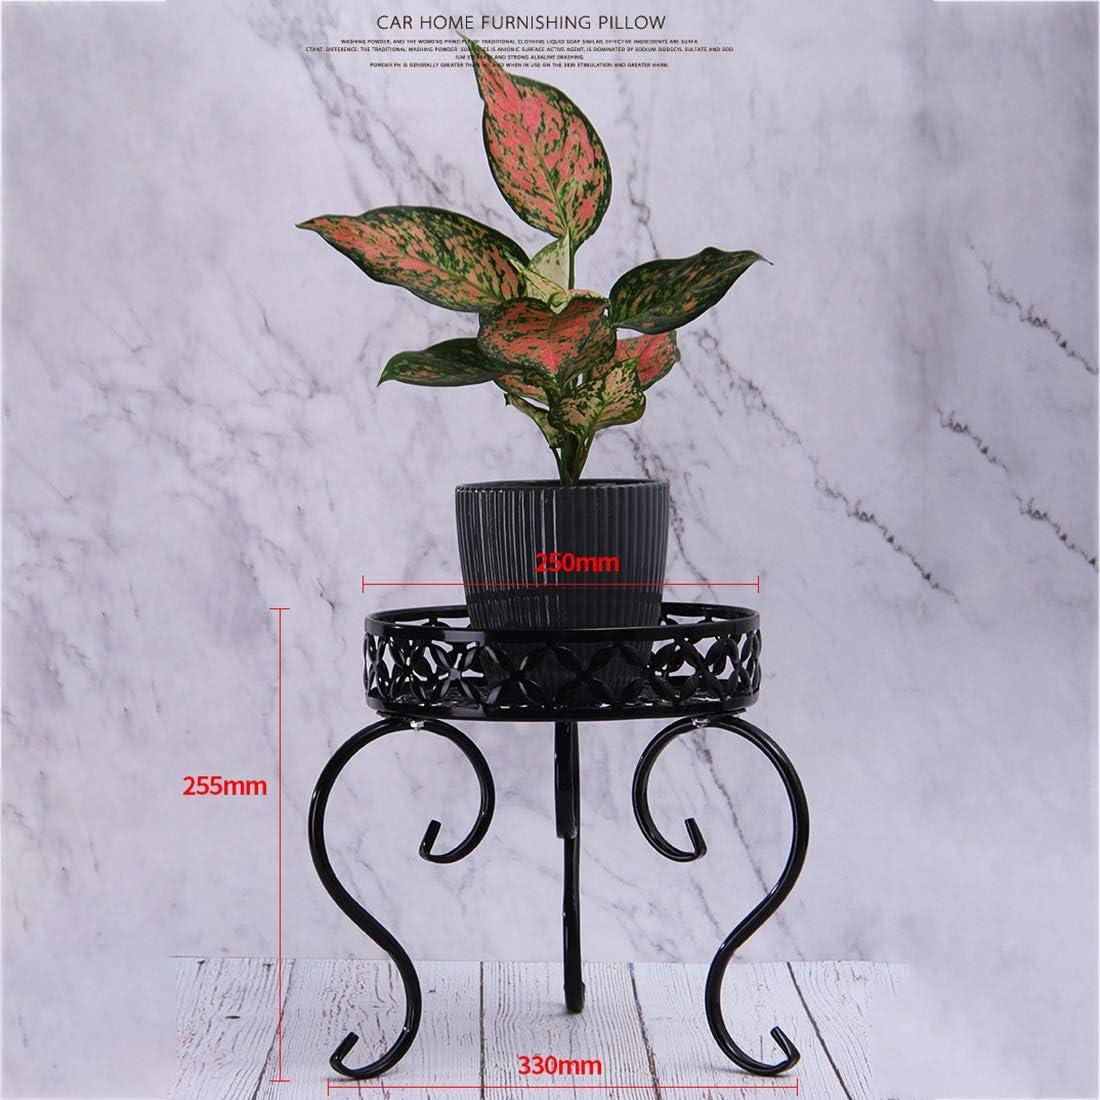 Teakpeak Metal Potted Plant Stand Round Metal Plant Pot Holder Metal Plant Pot Stand Indoor Outdoor